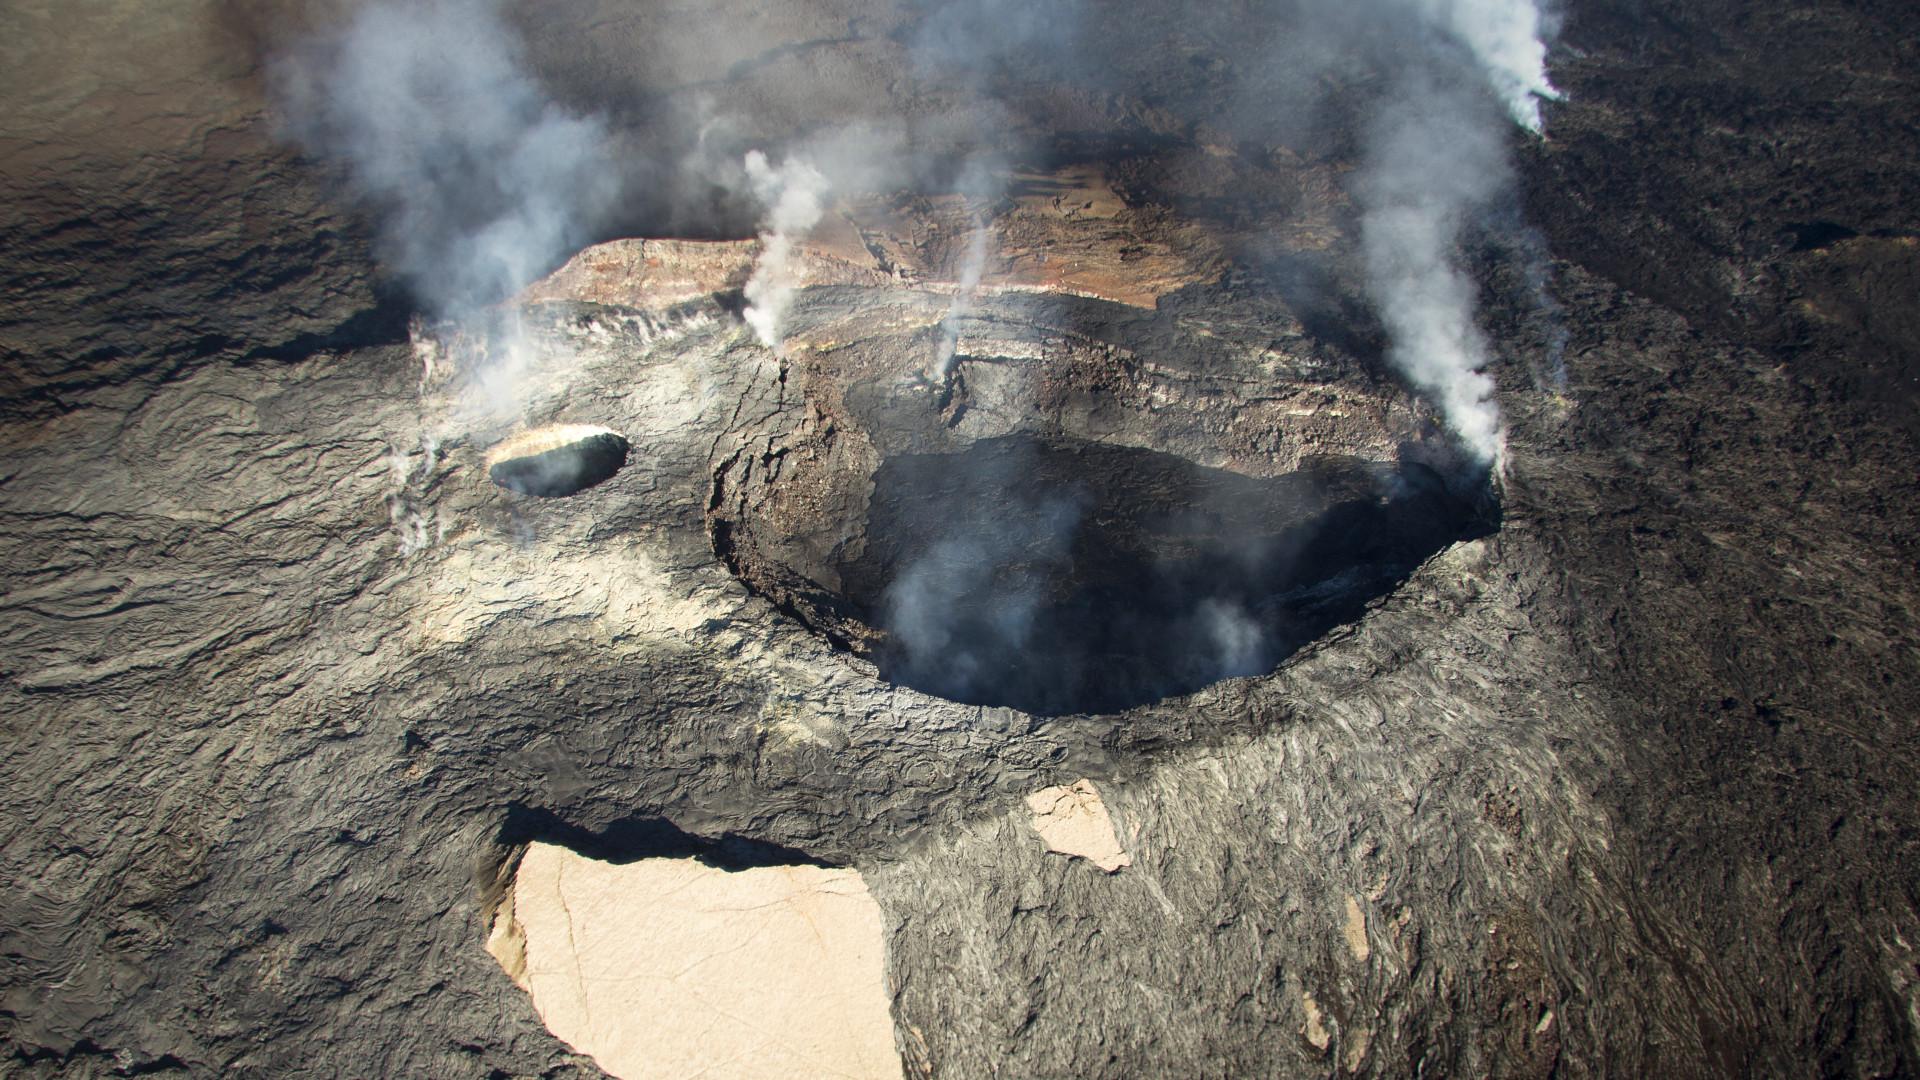 VIDEO: Recent Volcanic Activity At Pu'u O'o Explained